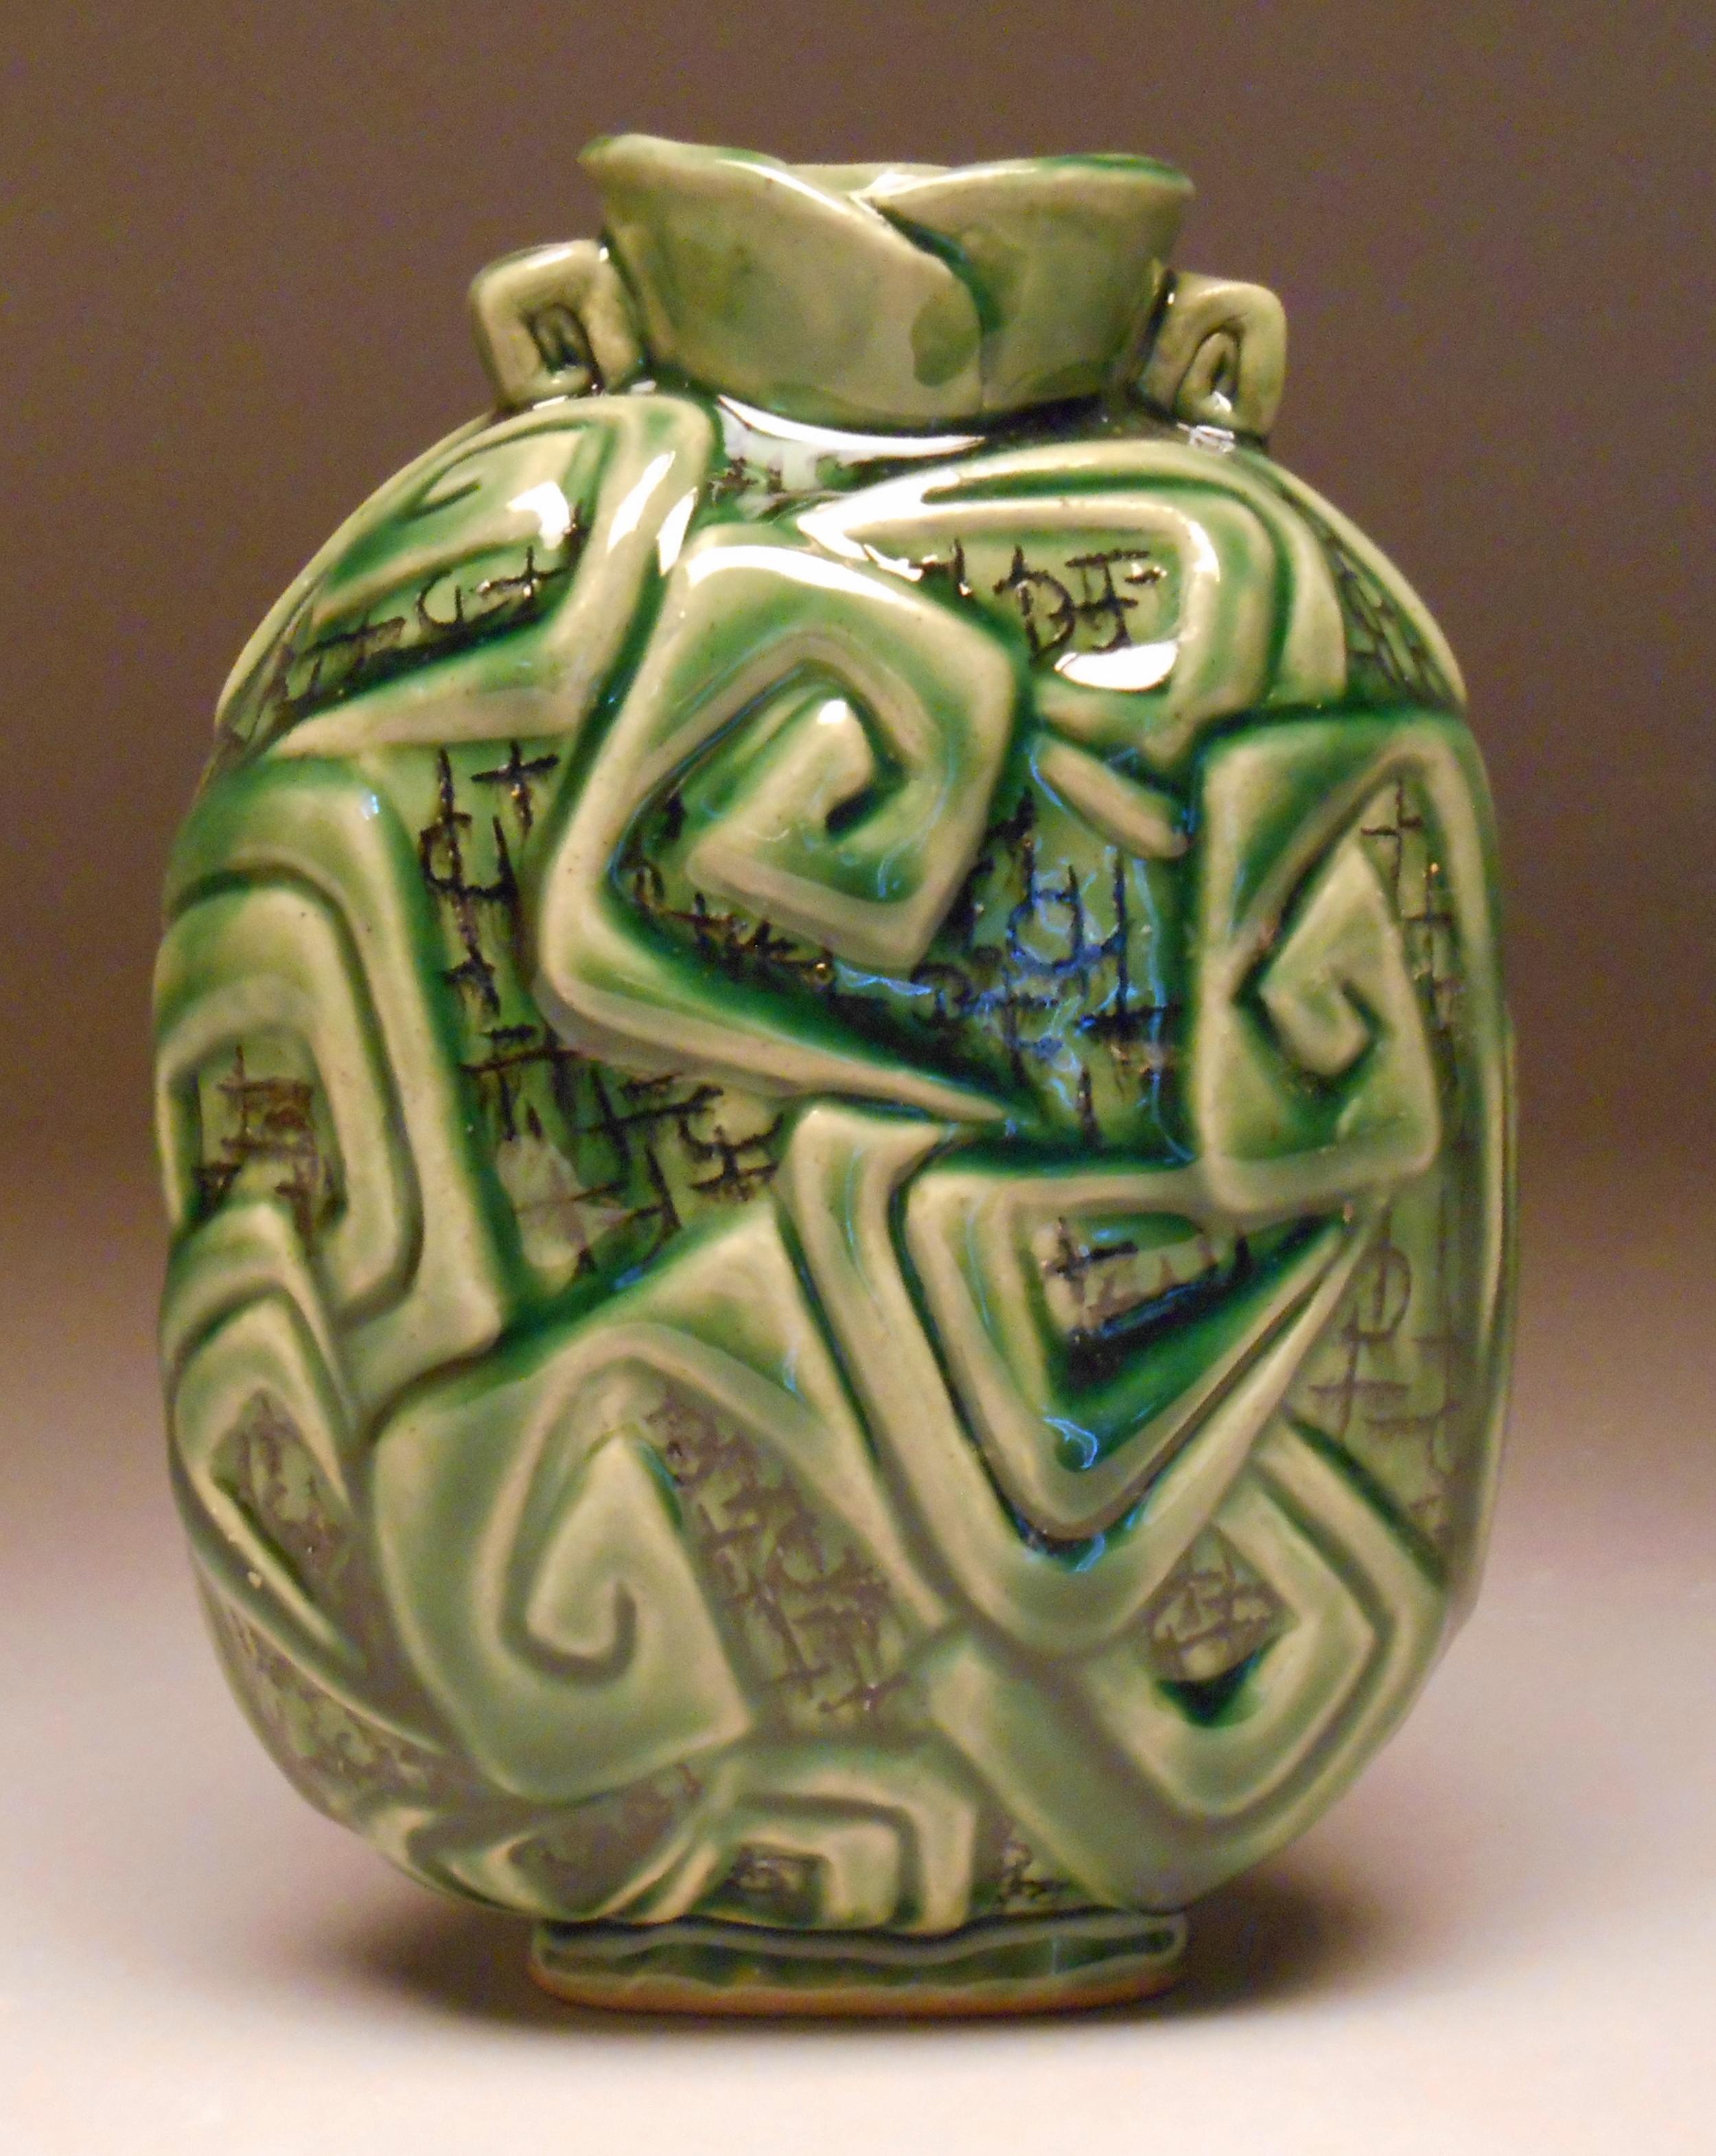 #299, Carved Vase, 7x5x3